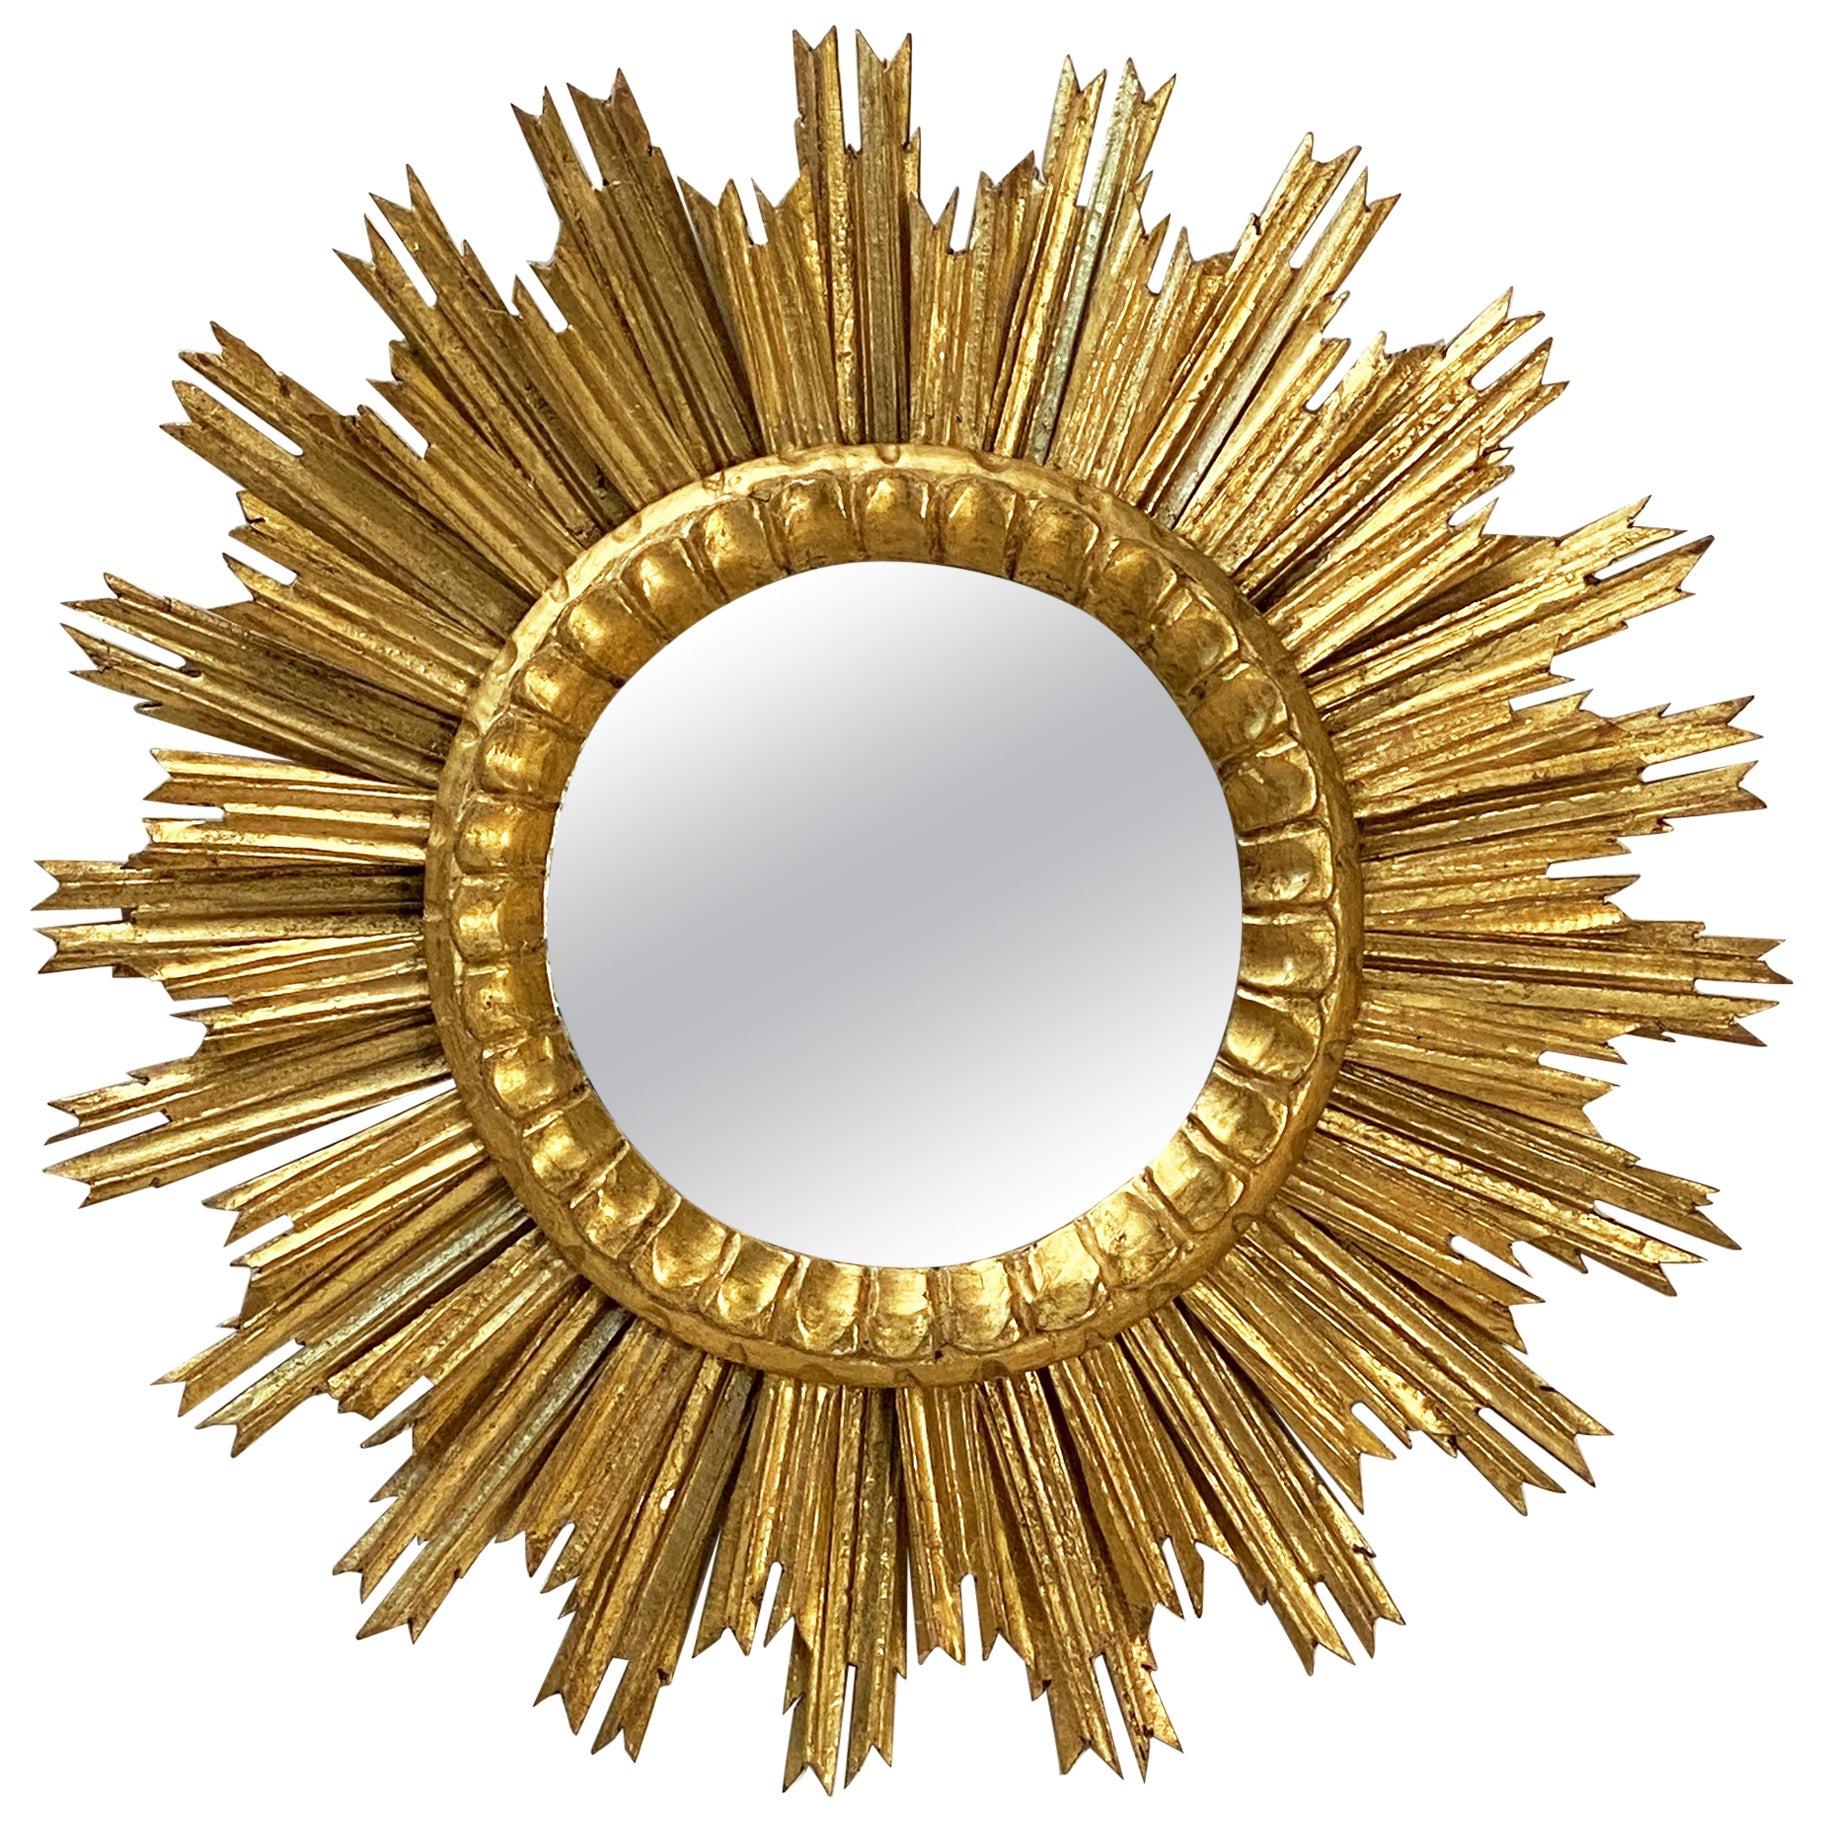 French Gilt Starburst or Sunburst Convex Mirror (Diameter 24)